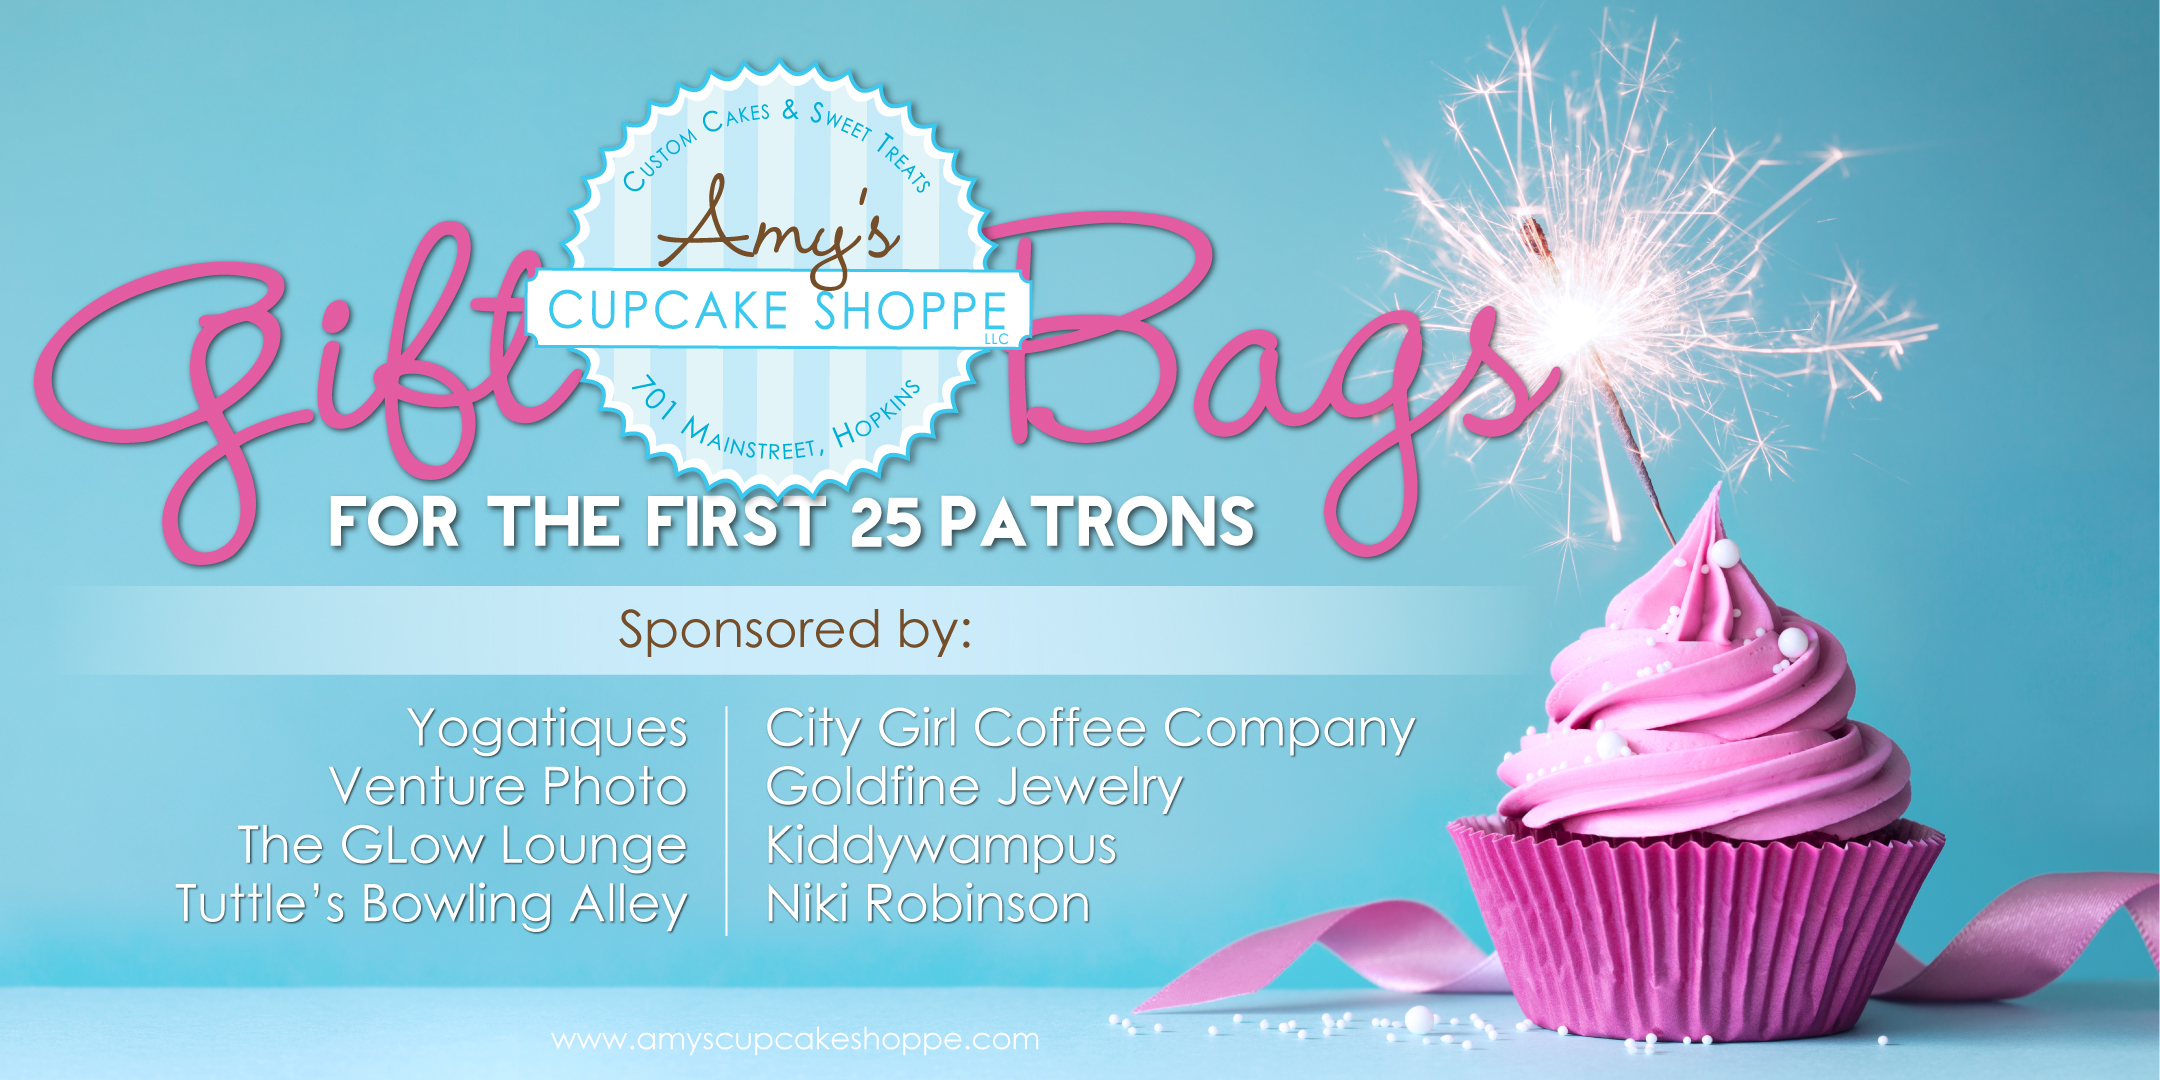 Amy's Cupcake Shoppe Grand Opening